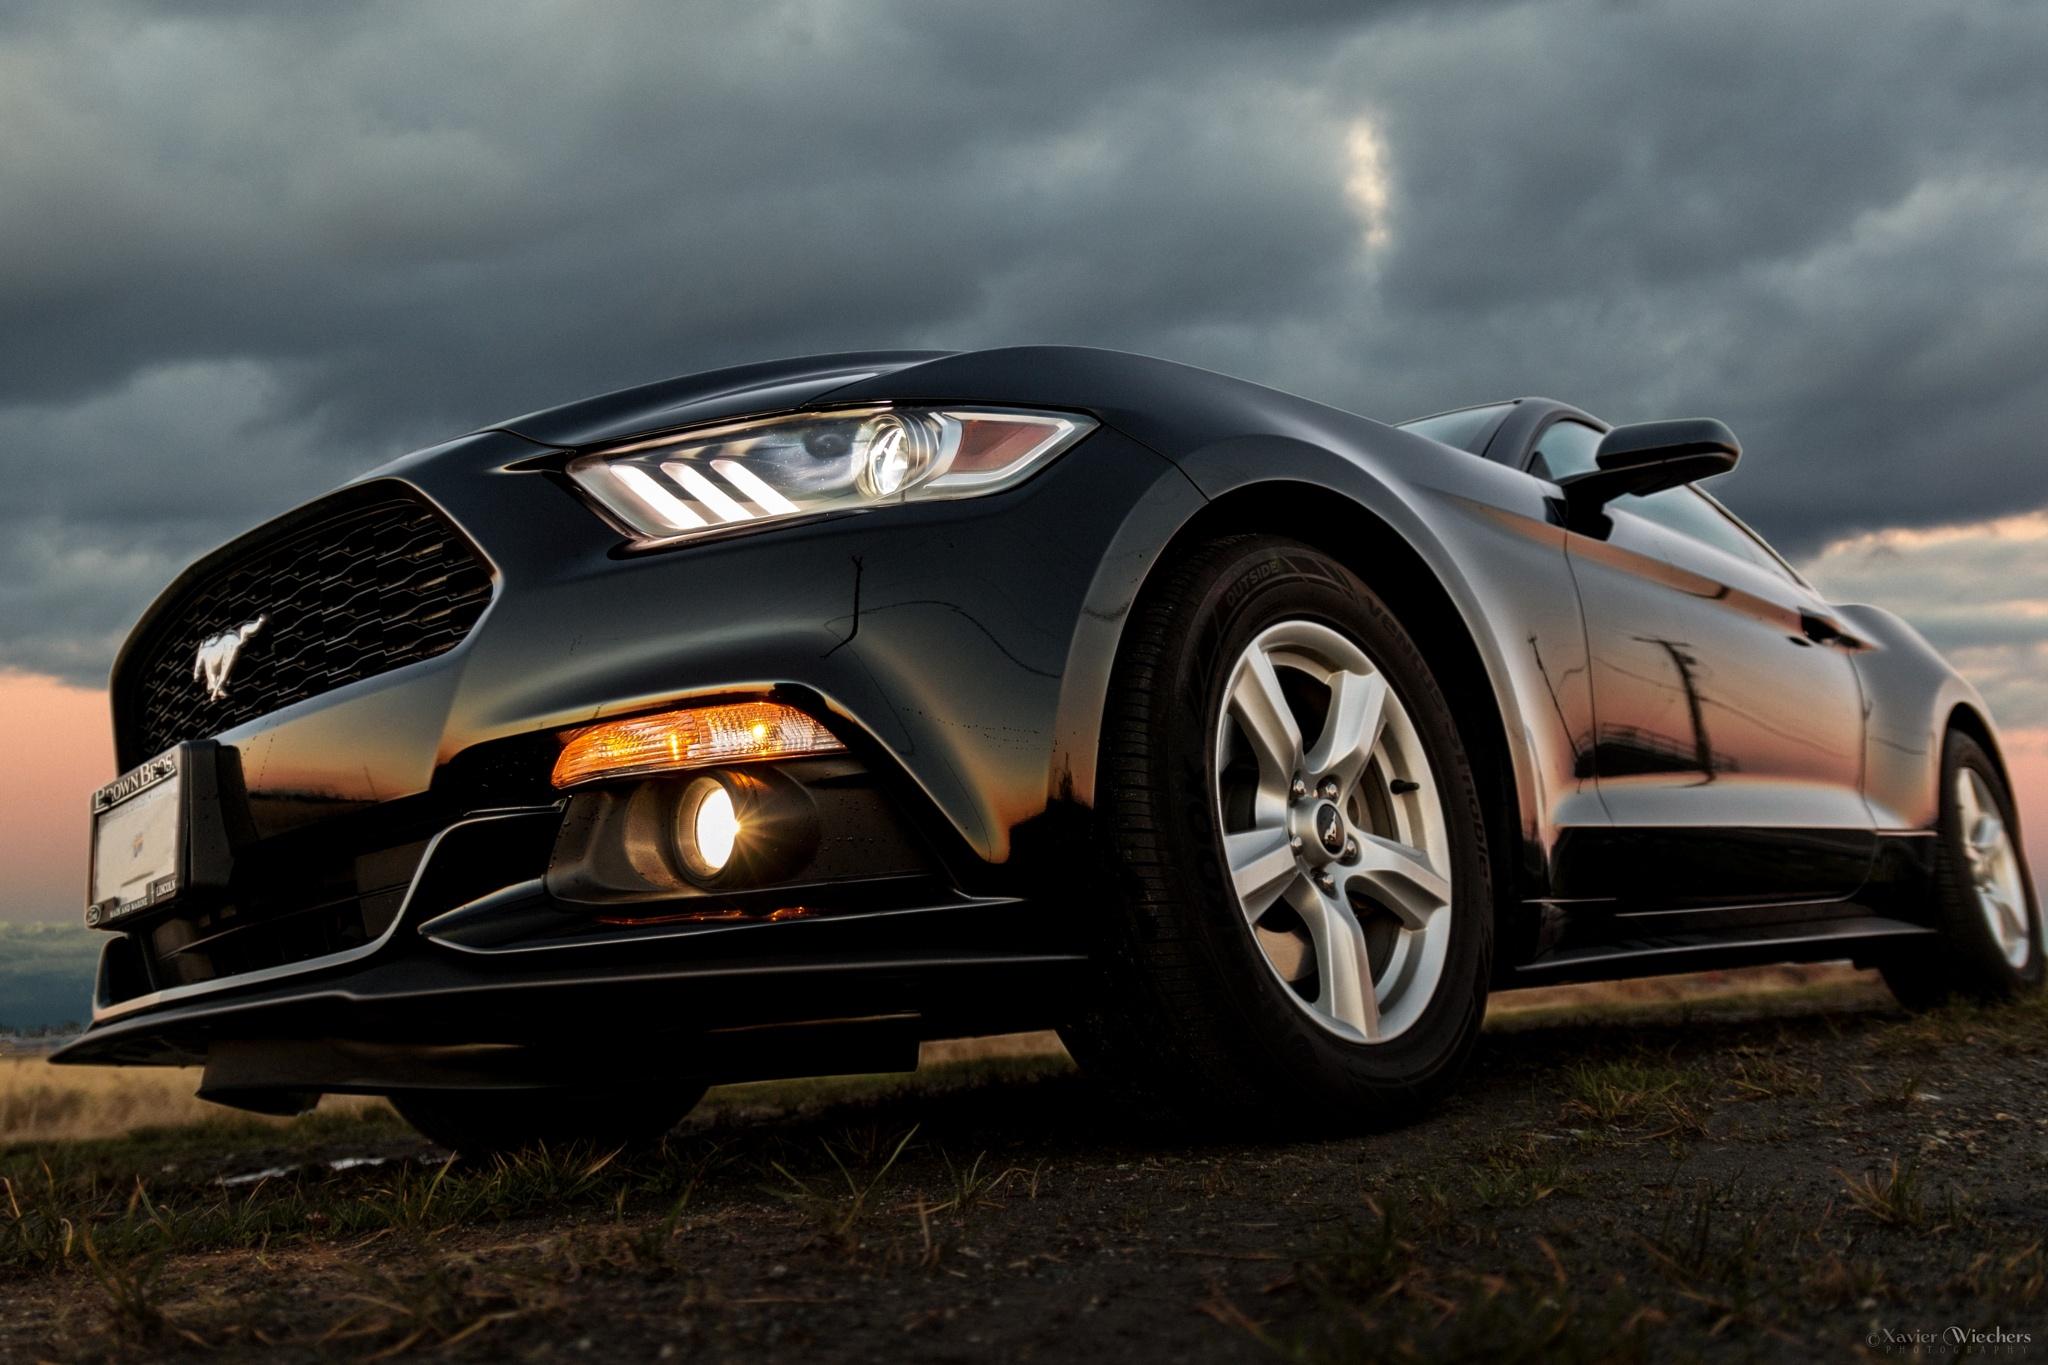 Xavier's Mustang 2015 - Sunset II by xwiechers